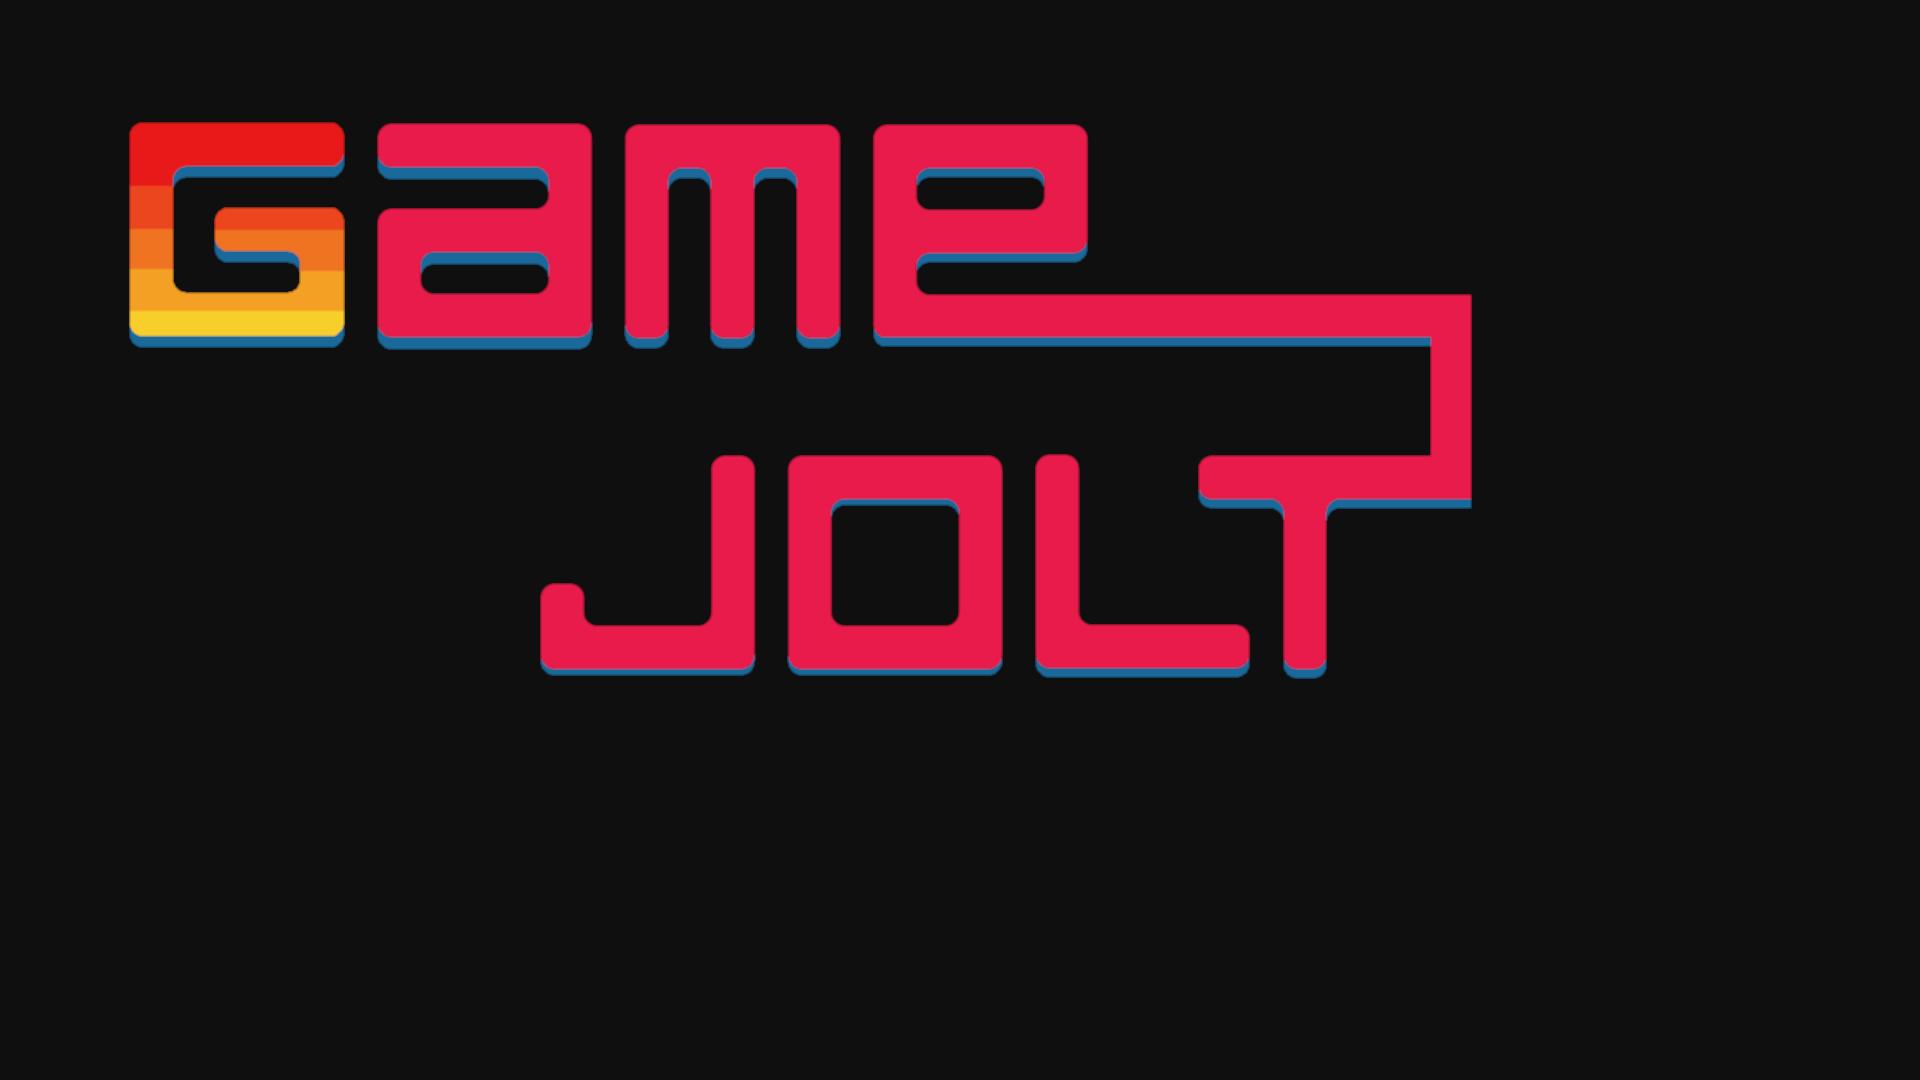 Game Jolt Retro 80s Wallpaper Game Jolt